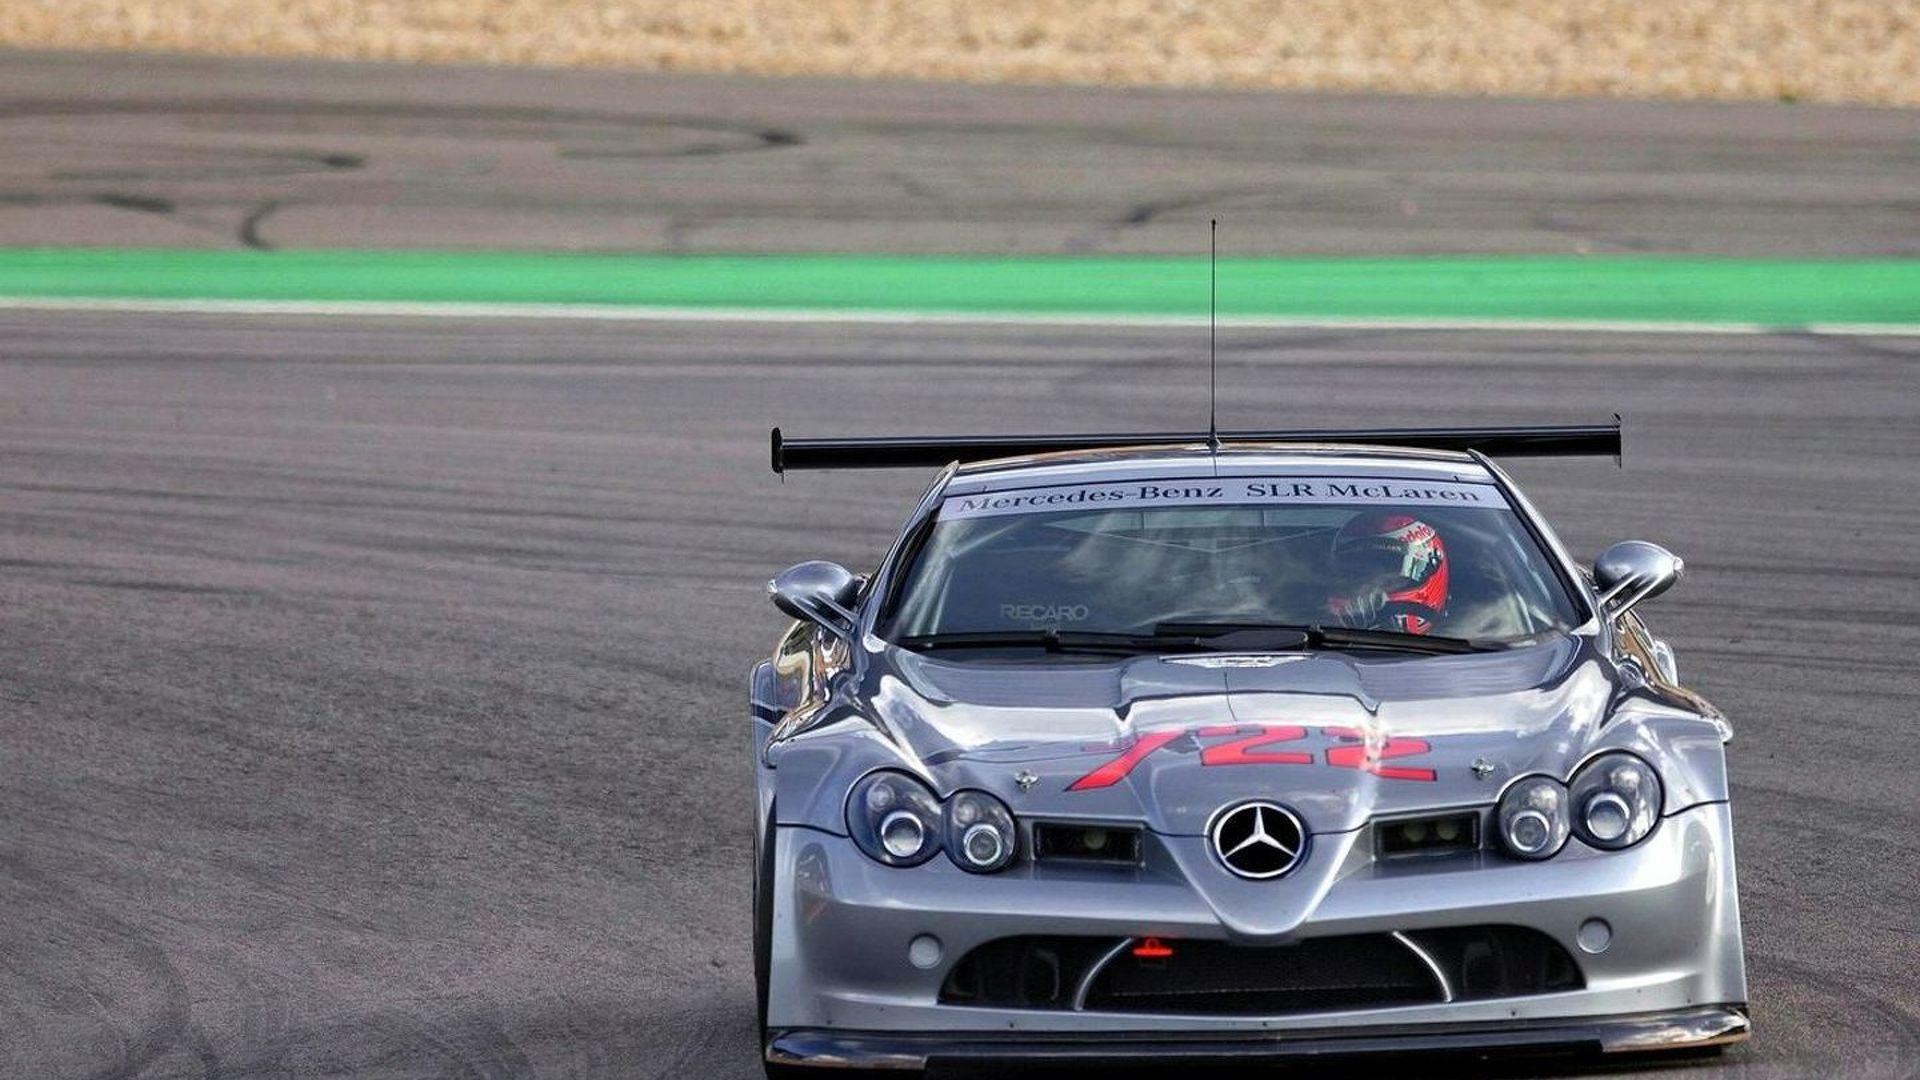 Mercedes-Benz SLR McLaren 722 Pricing & Availability (US)